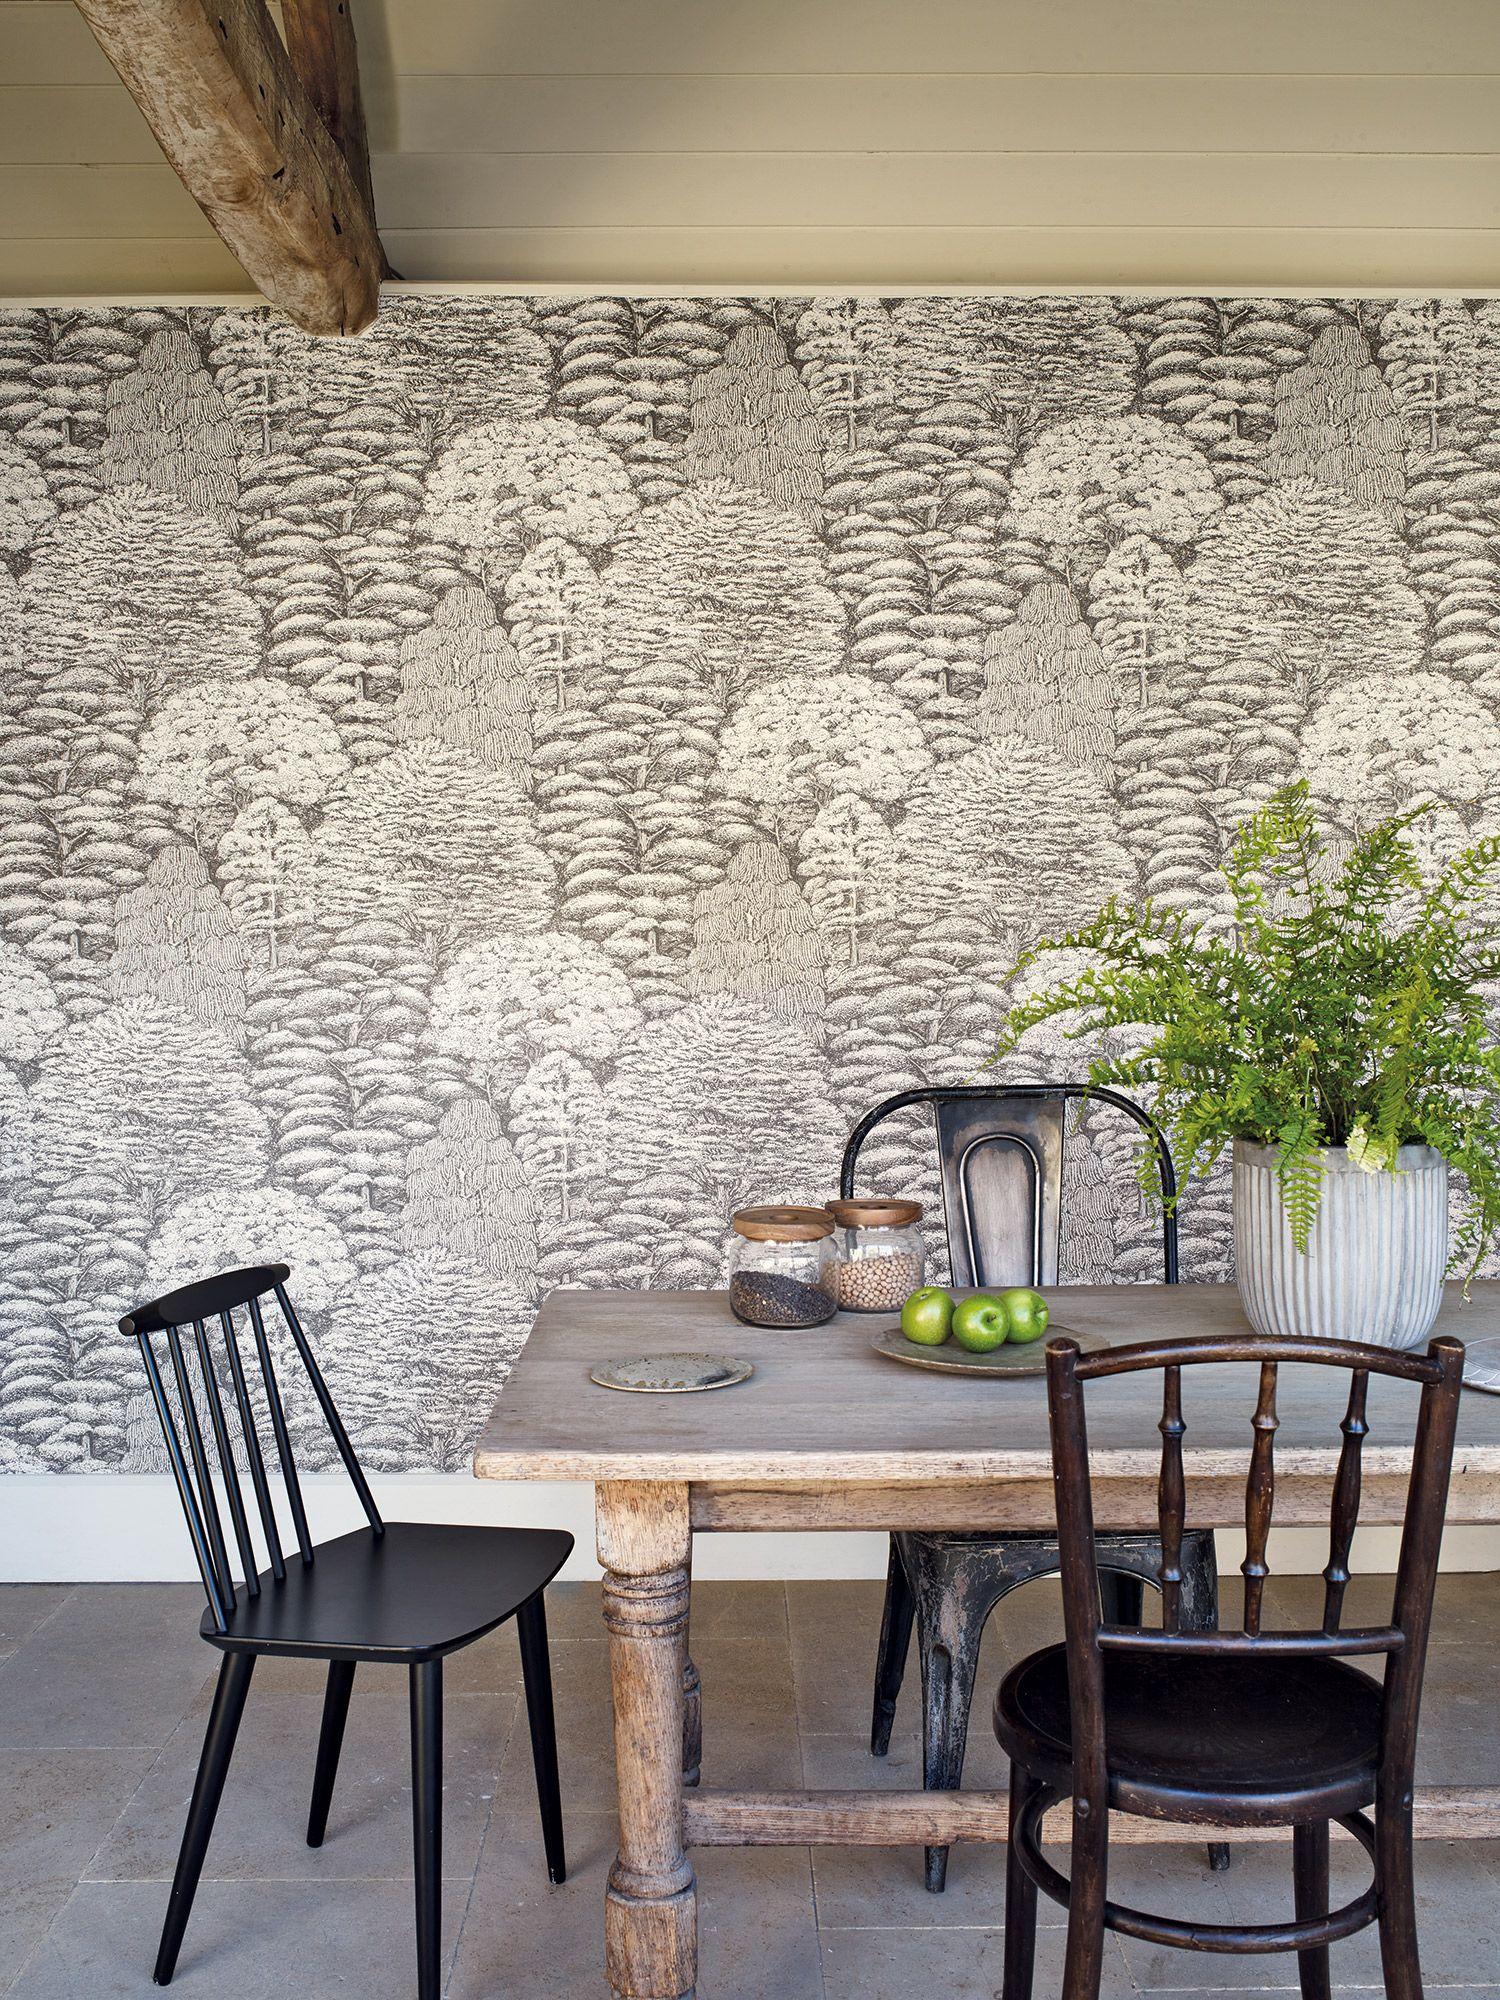 Sanderson wallpaper Woodland Toile This design creates